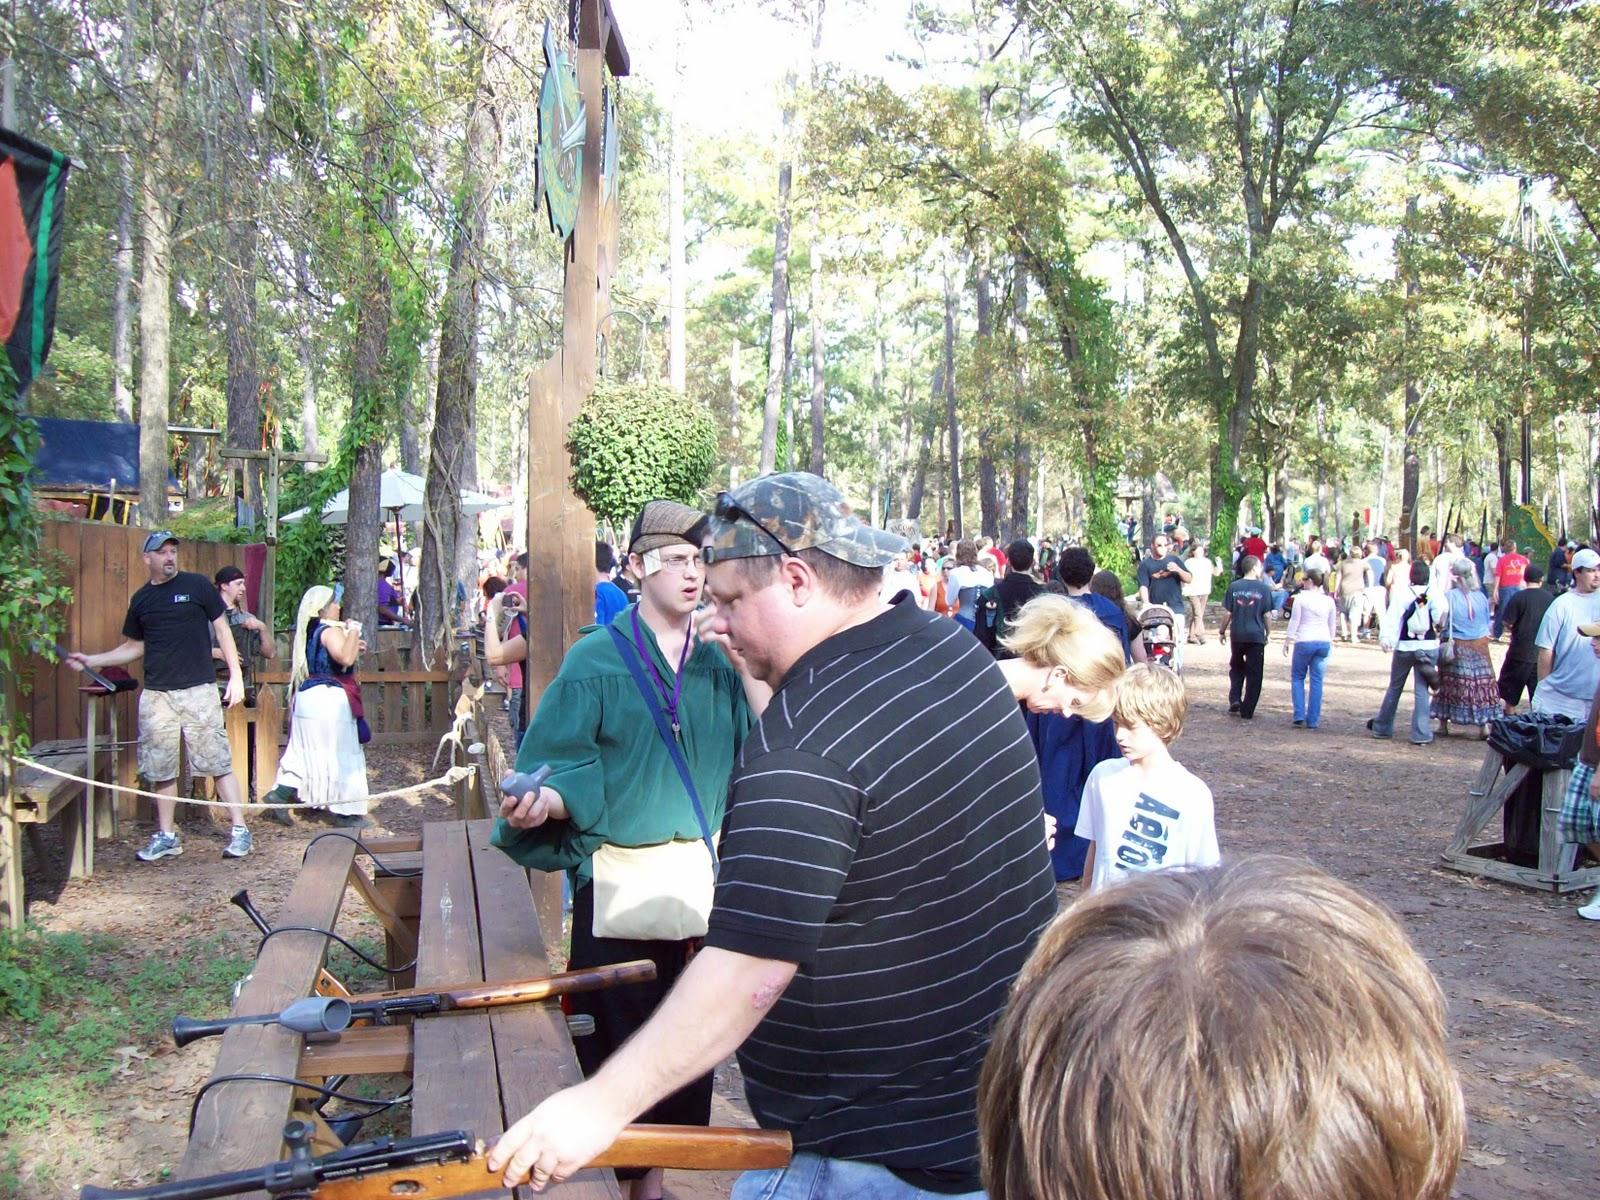 Texas Renaissance Festival - 101_5789.JPG